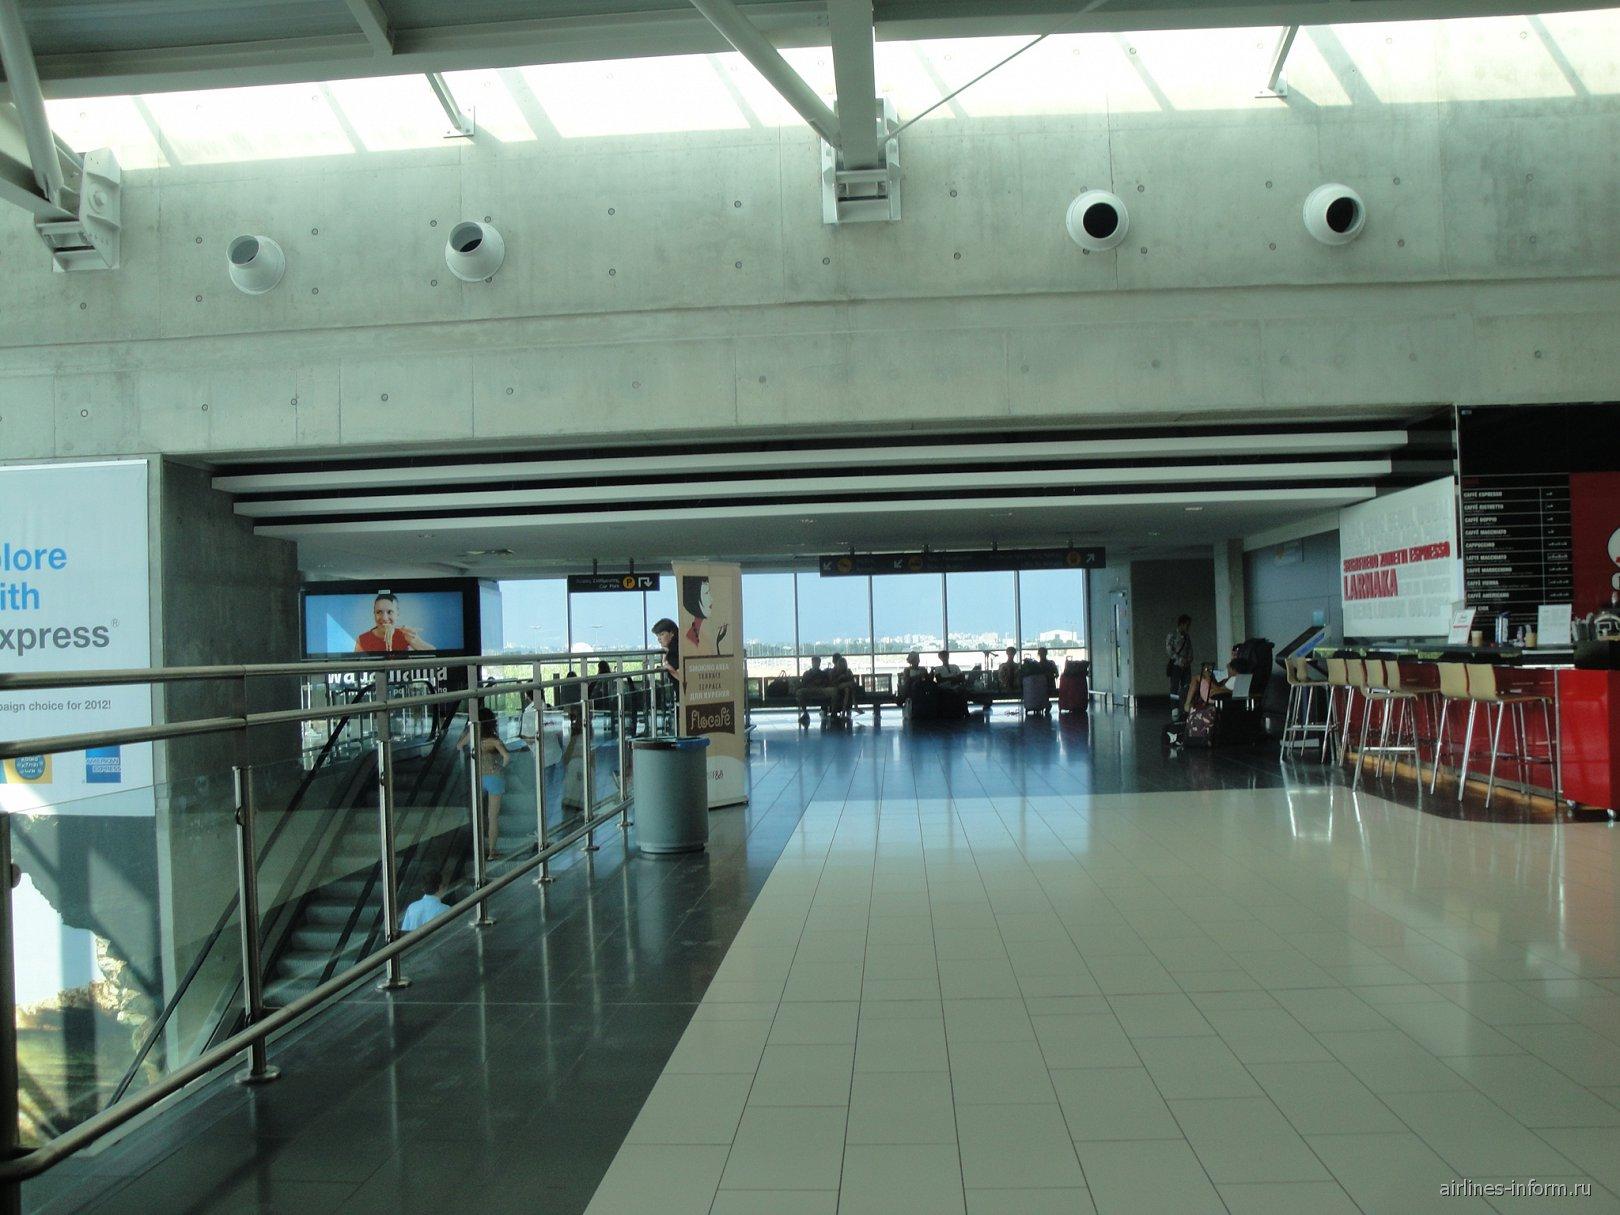 В аэровокзале аэропорта Ларнака